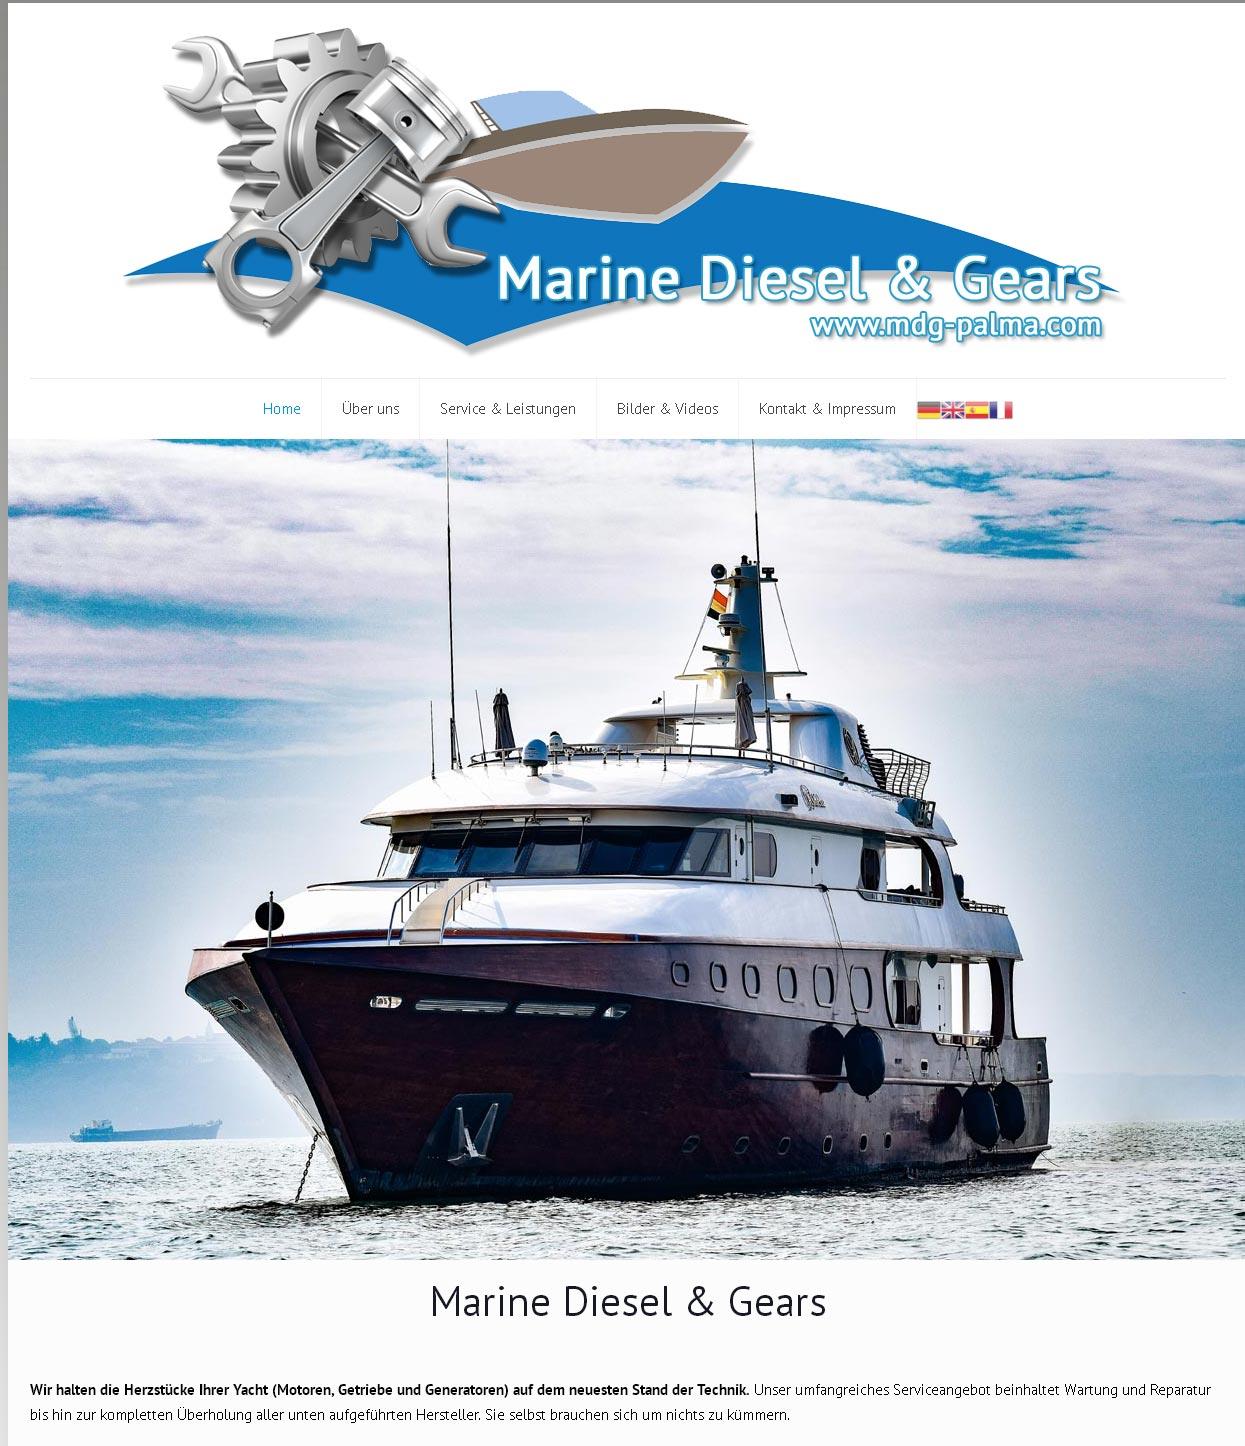 MDG Palma - Marine Diesel & Gears Palma